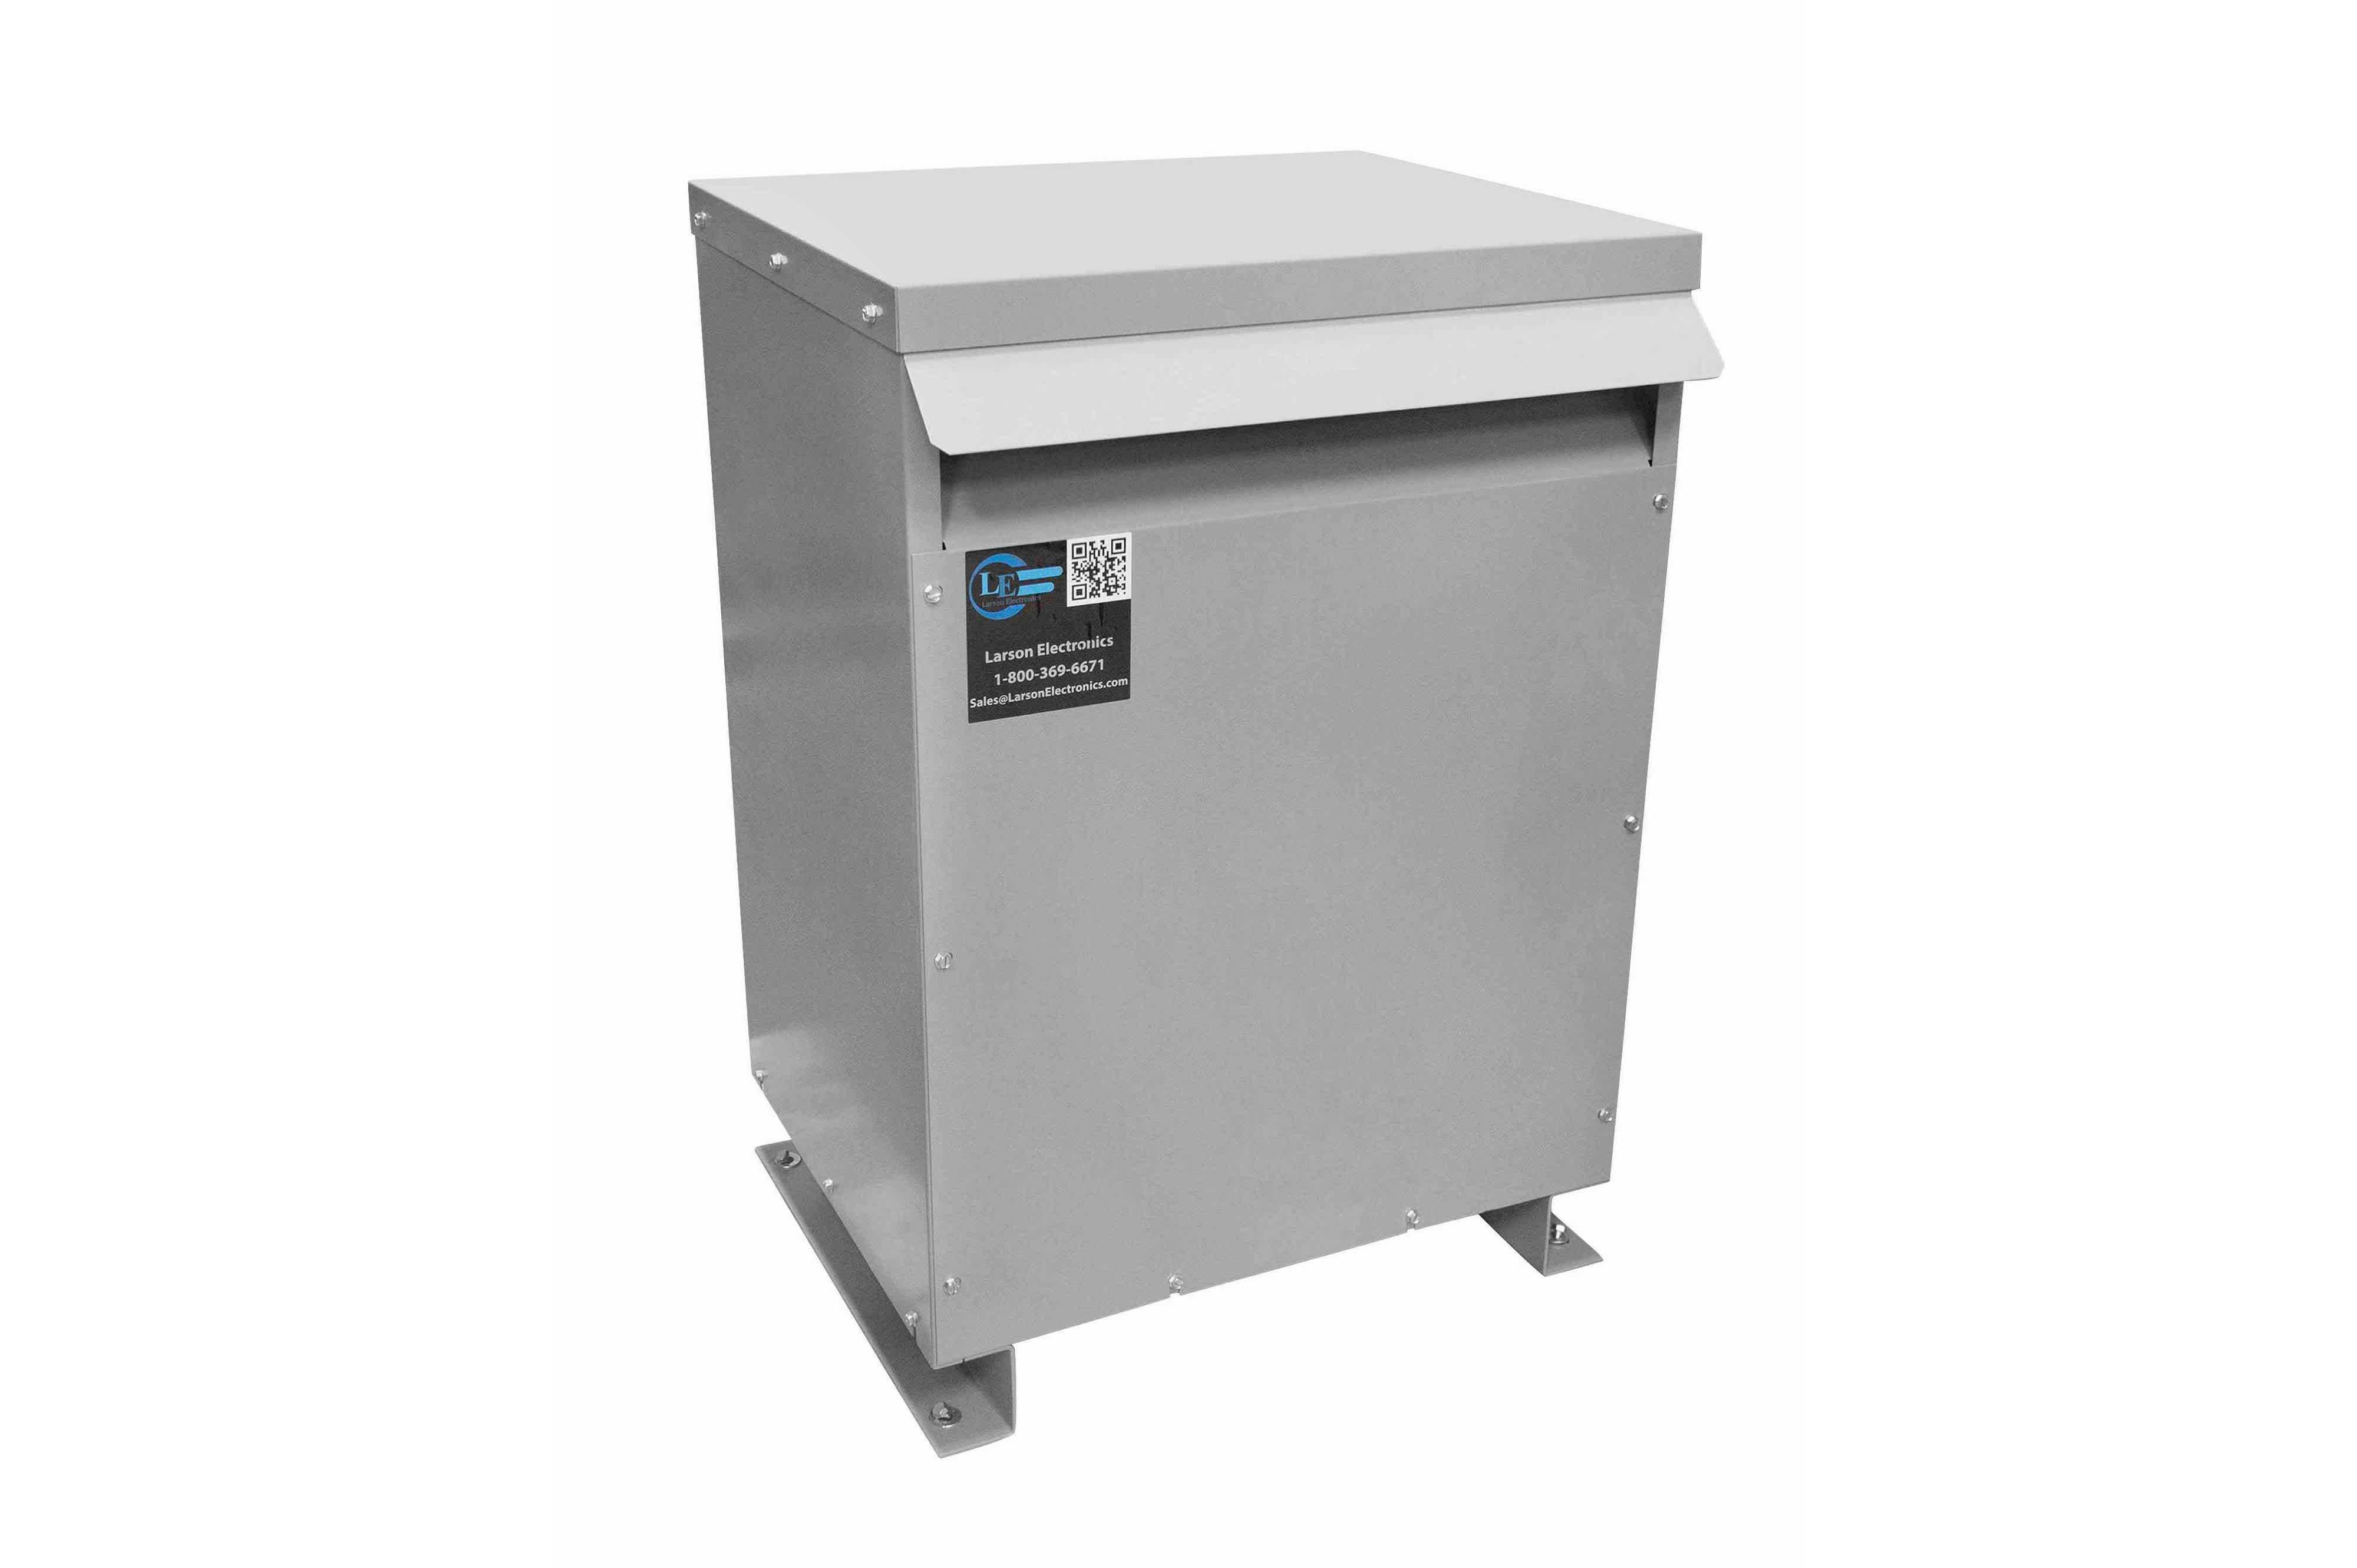 500 kVA 3PH DOE Transformer, 240V Delta Primary, 600Y/347 Wye-N Secondary, N3R, Ventilated, 60 Hz